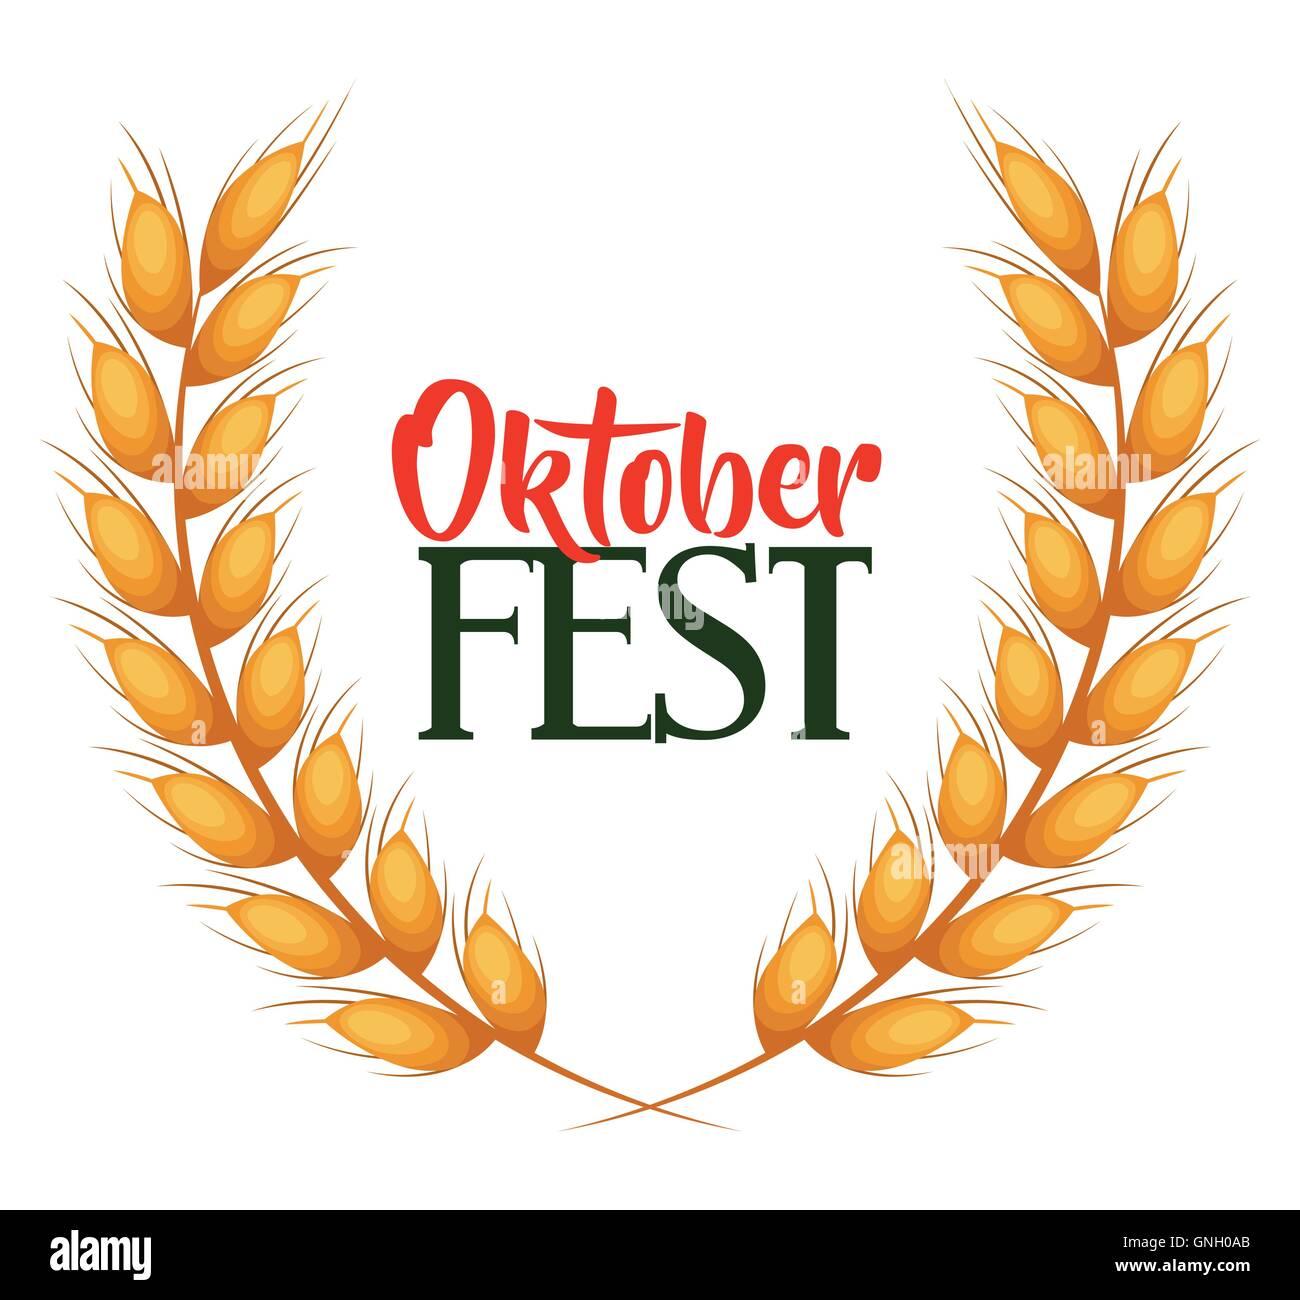 oktober fest invitation poster - Stock Image